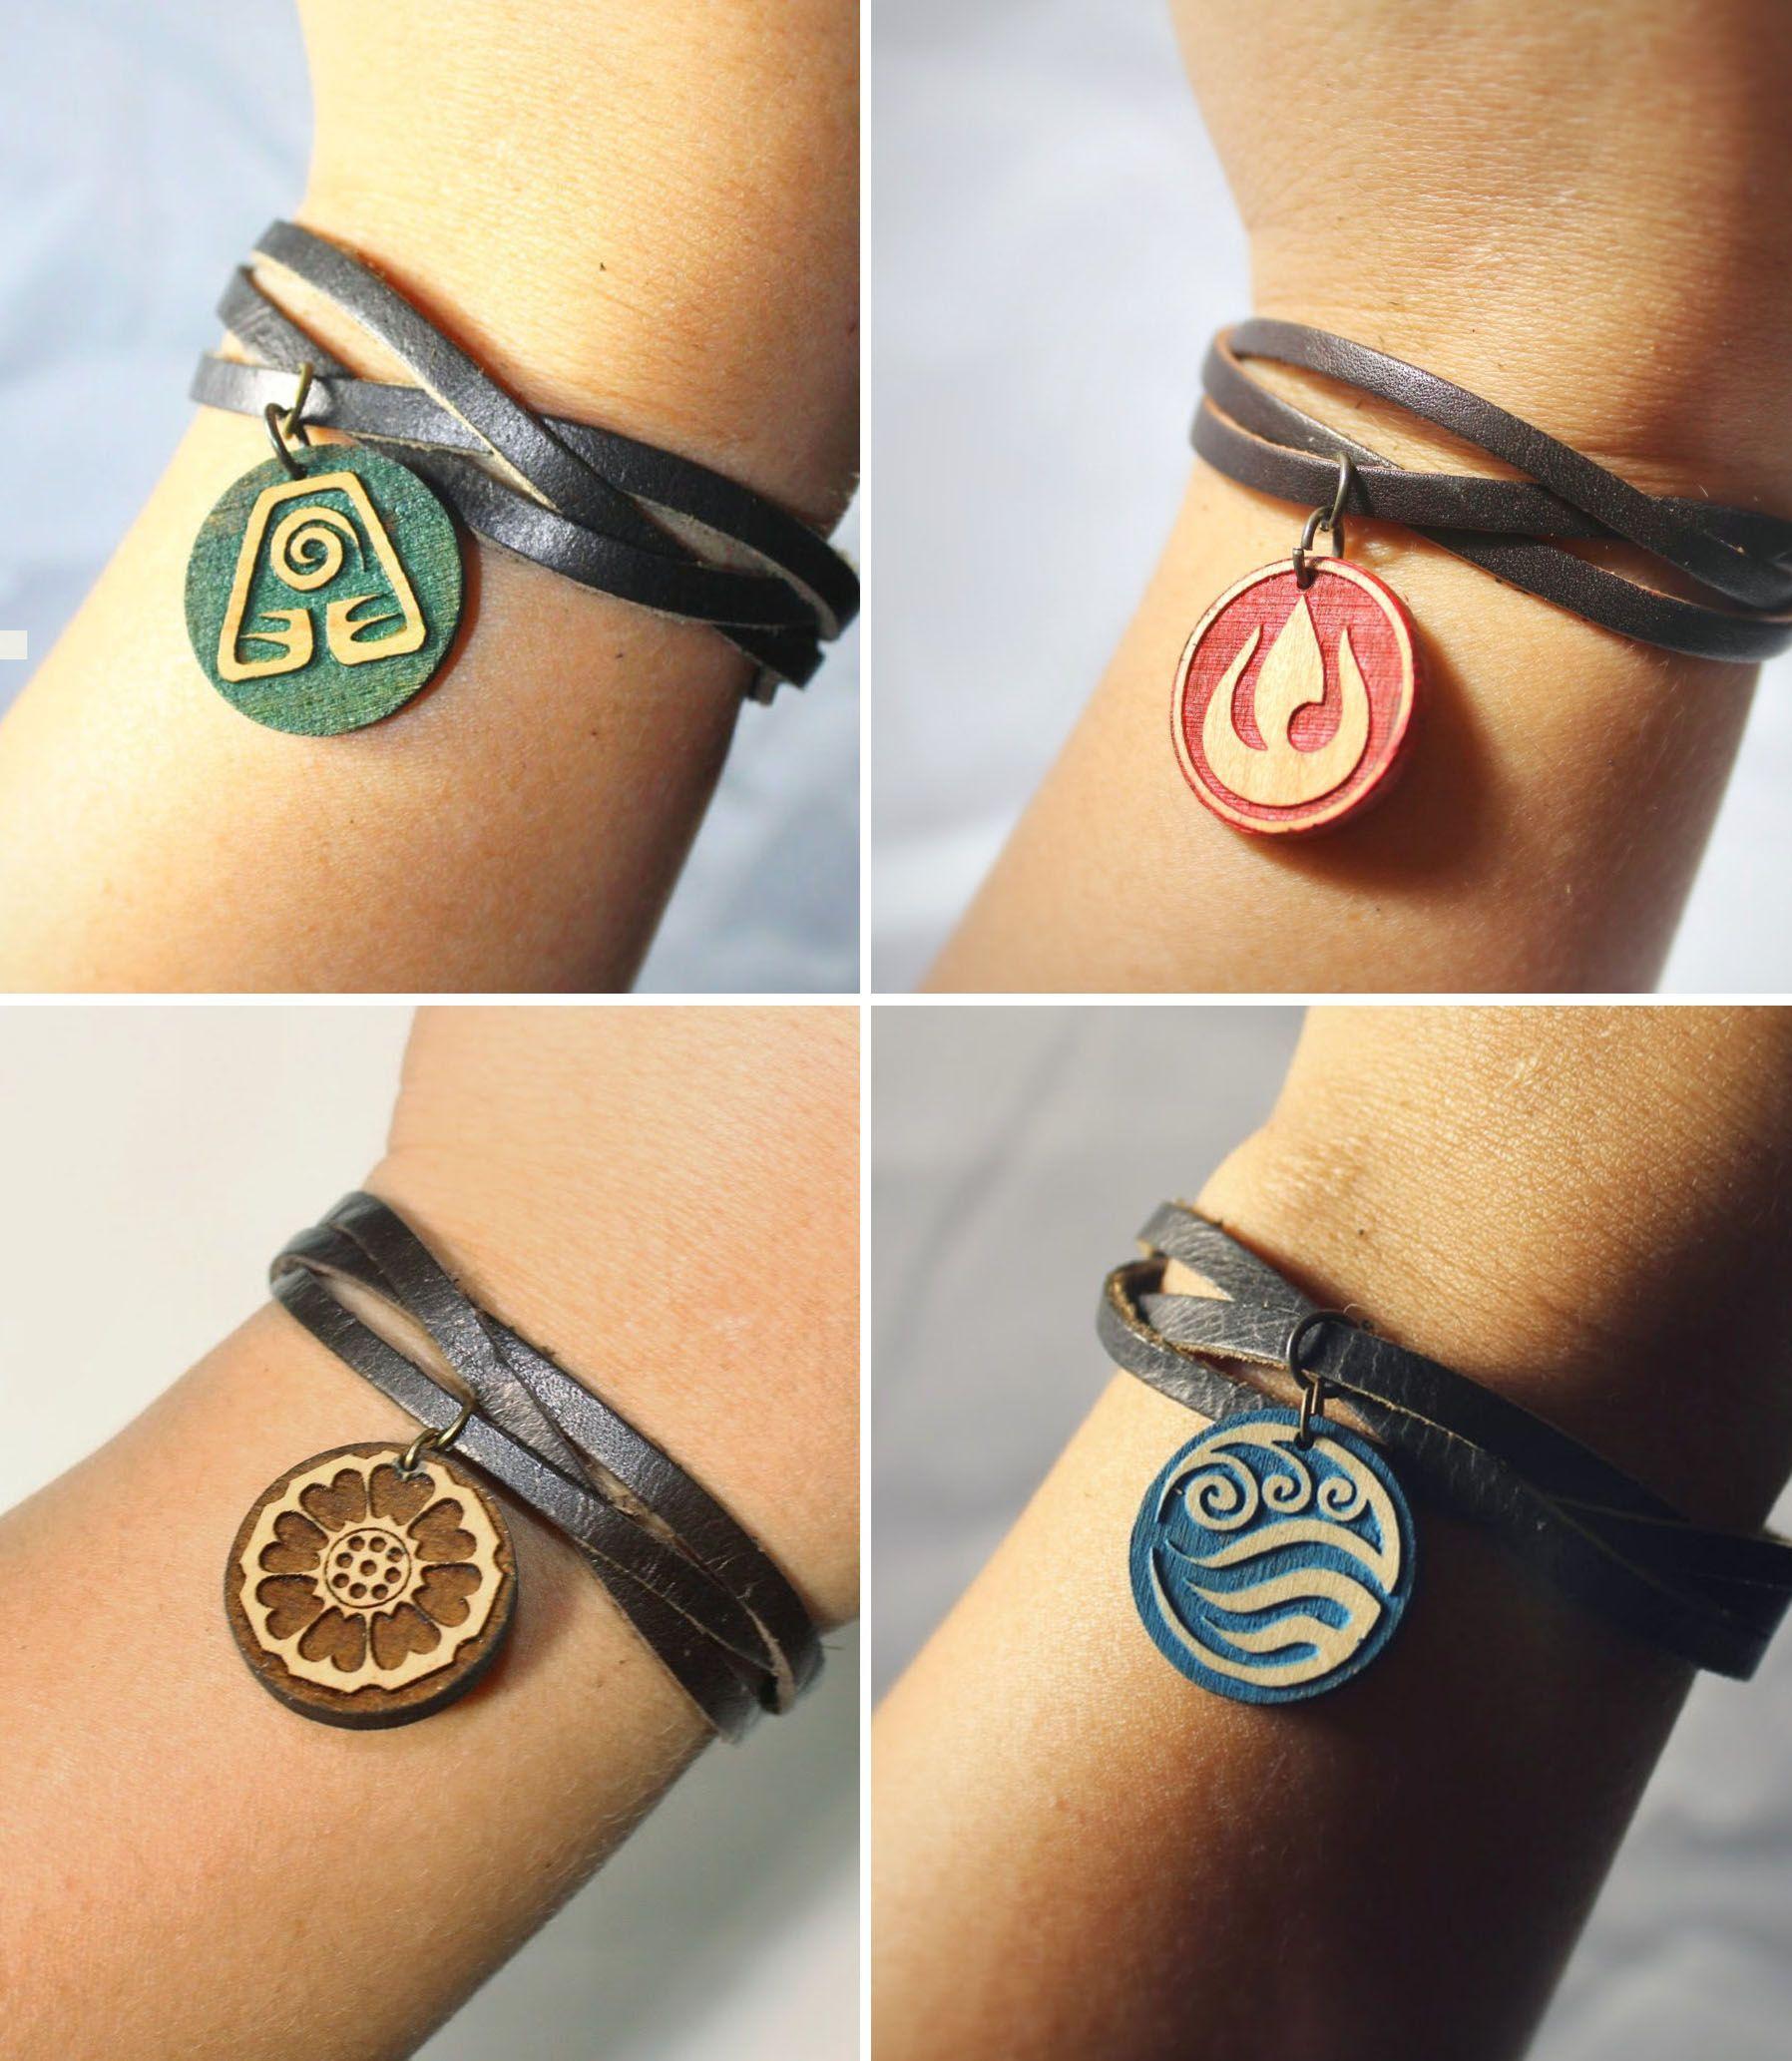 Avatar Bracelets & Pins in 2020 Avatar airbender, Avatar